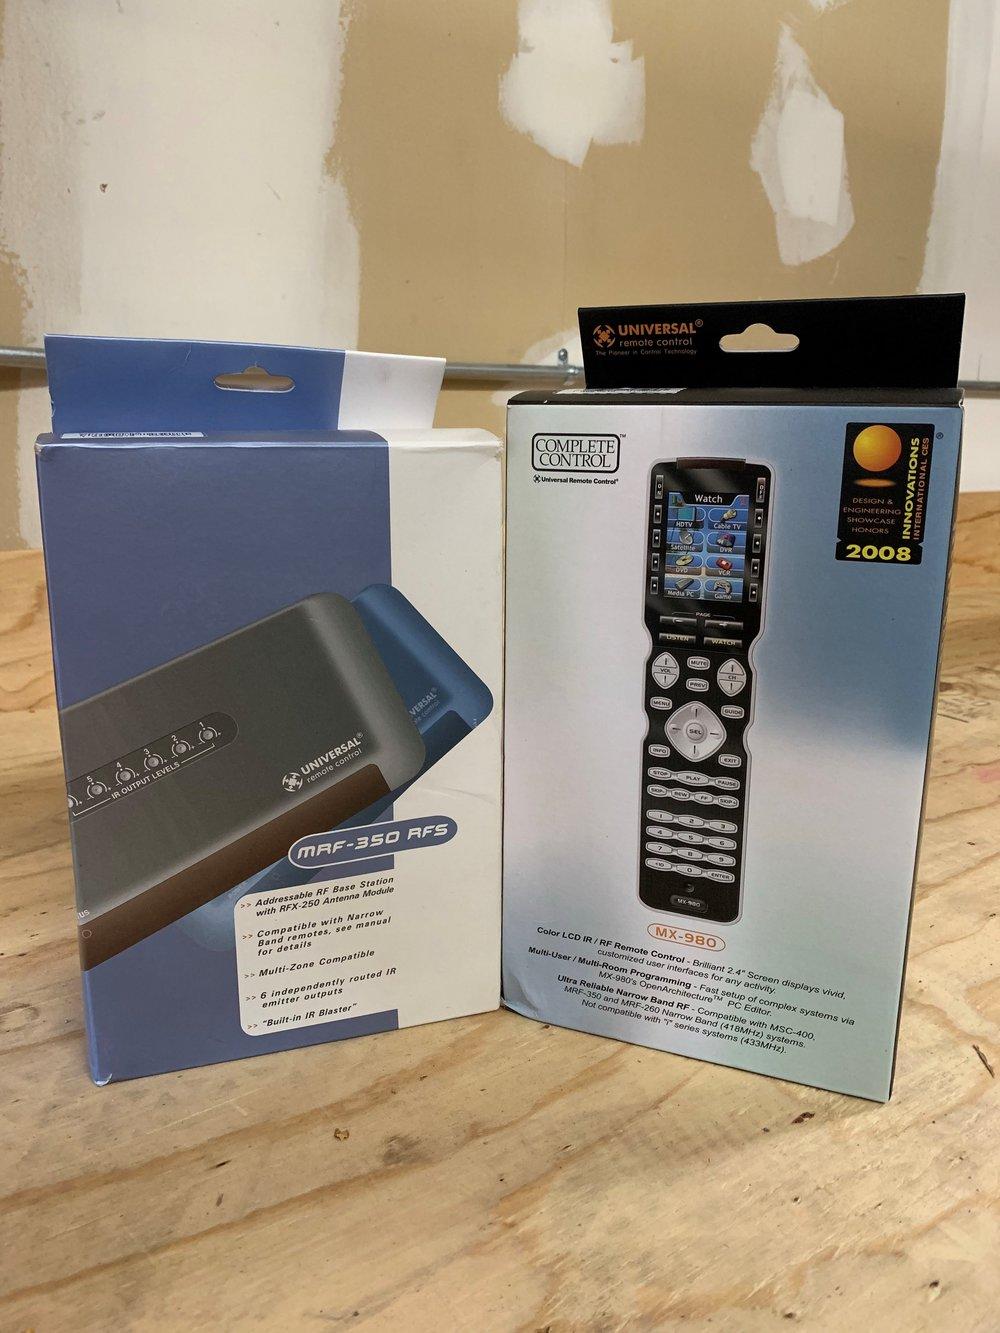 MX-980 Remote & MRF 350 set  Both new in box  $593